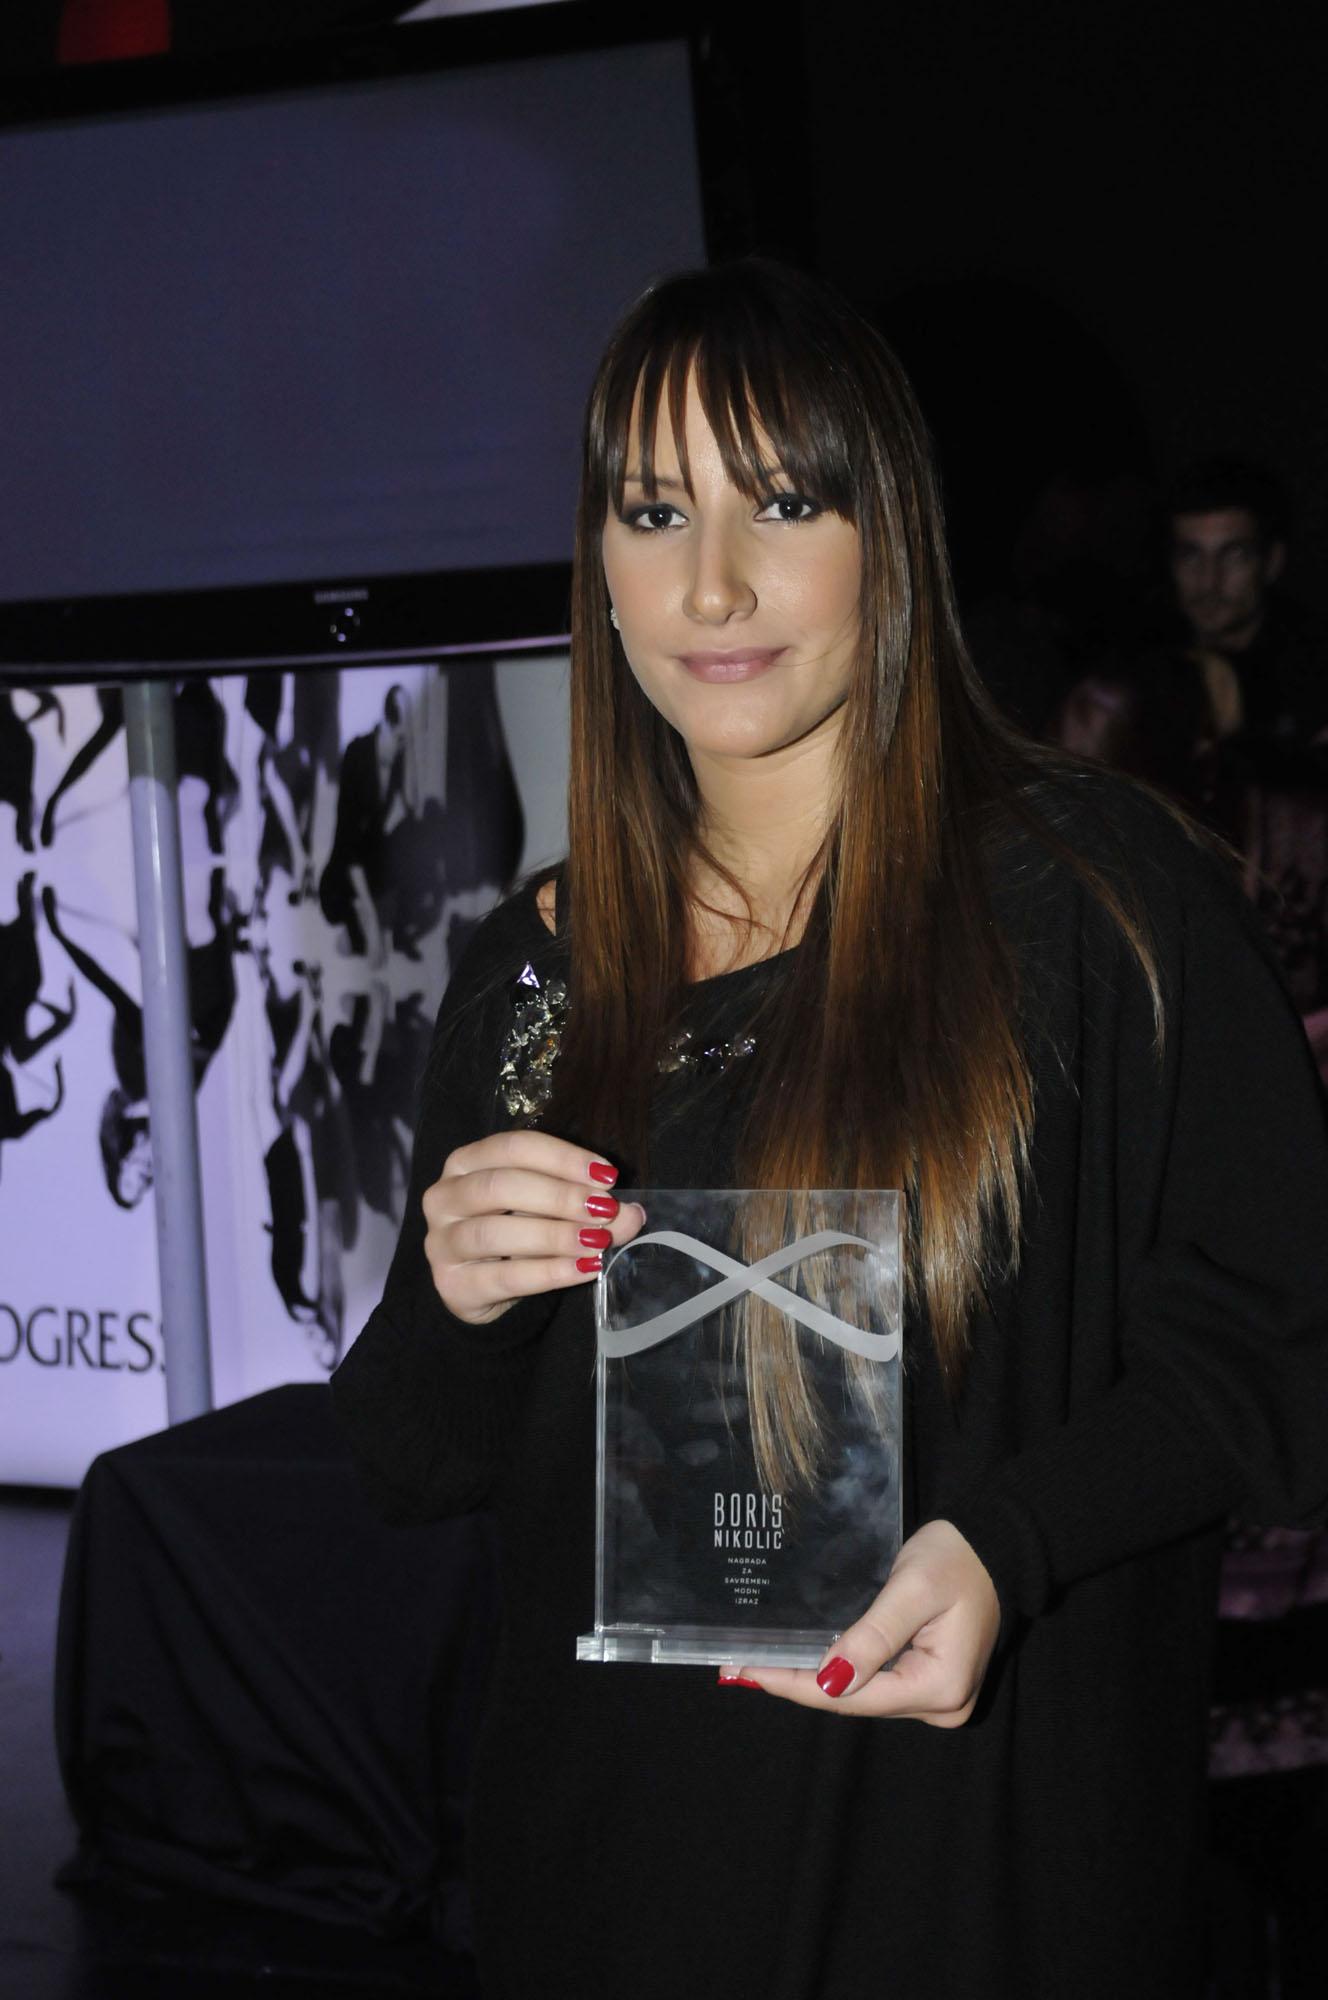 ljuba sikimic Nagrade 30. Beogradske nedelje mode